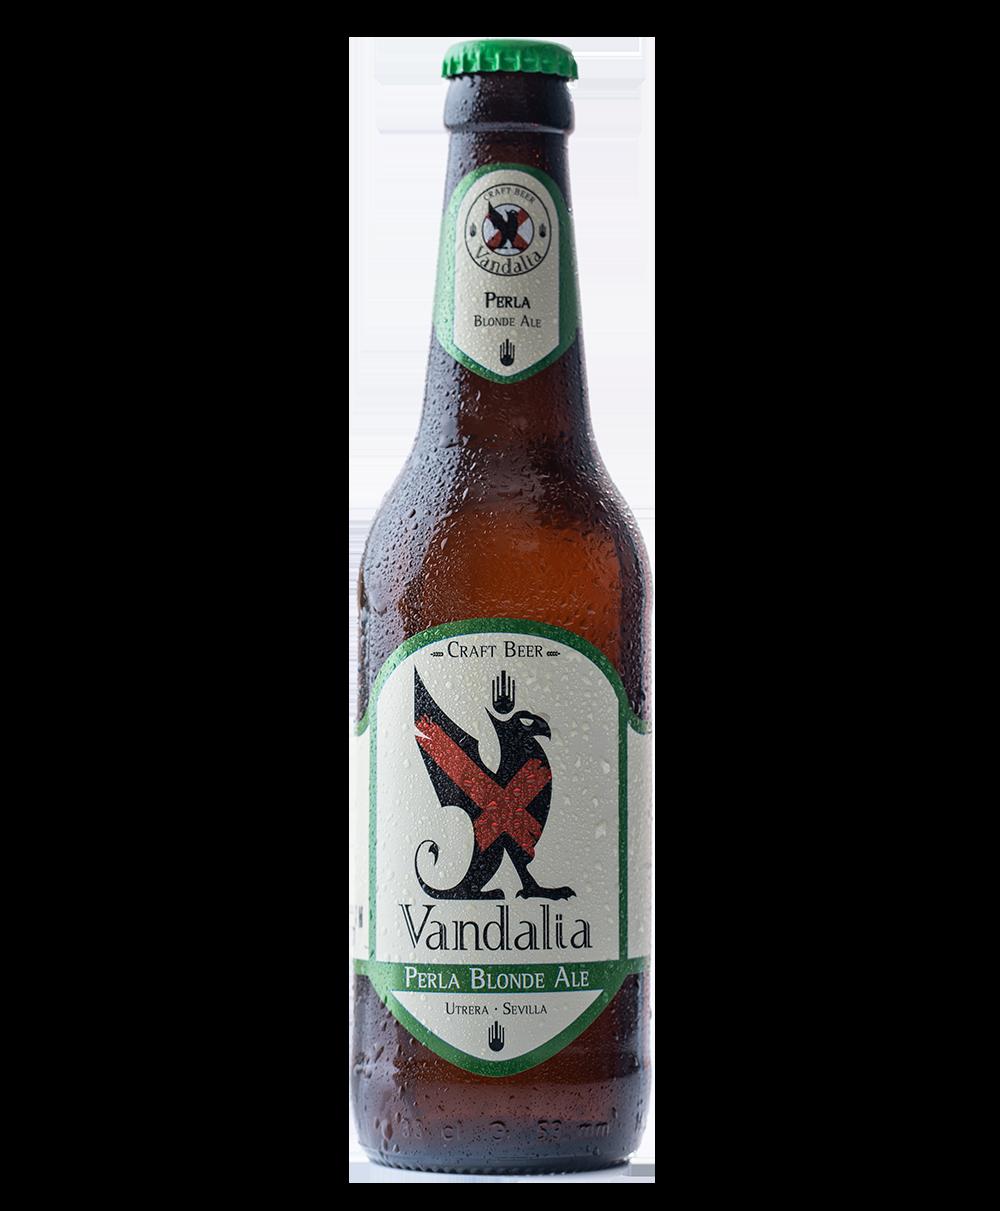 https://cervezasvandalia.com/wp-content/uploads/2019/04/perla.png